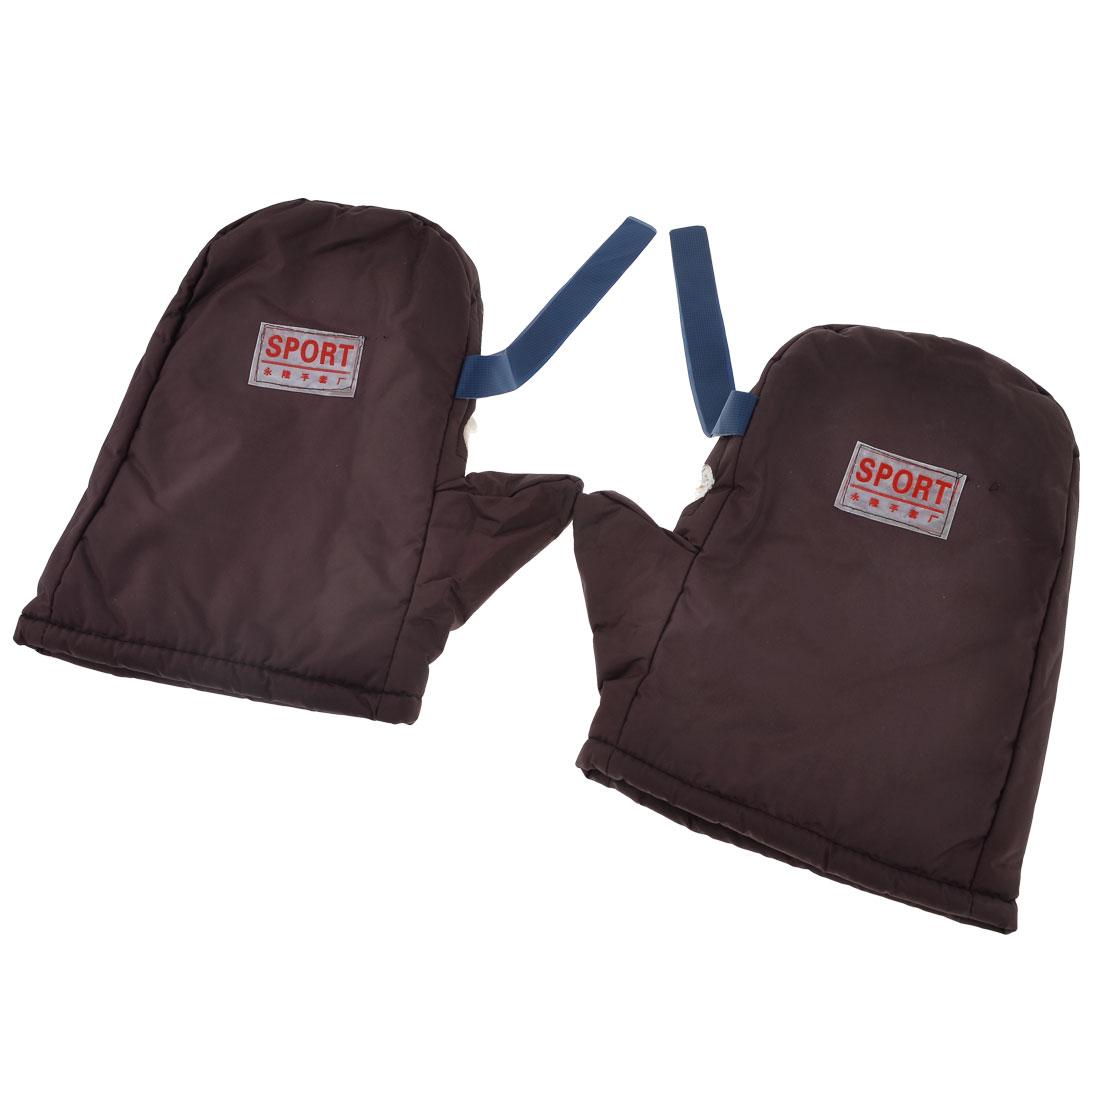 Man Warmer Mini Grids Print Plush Lining Burgundy Sports Mitten Gloves Pair